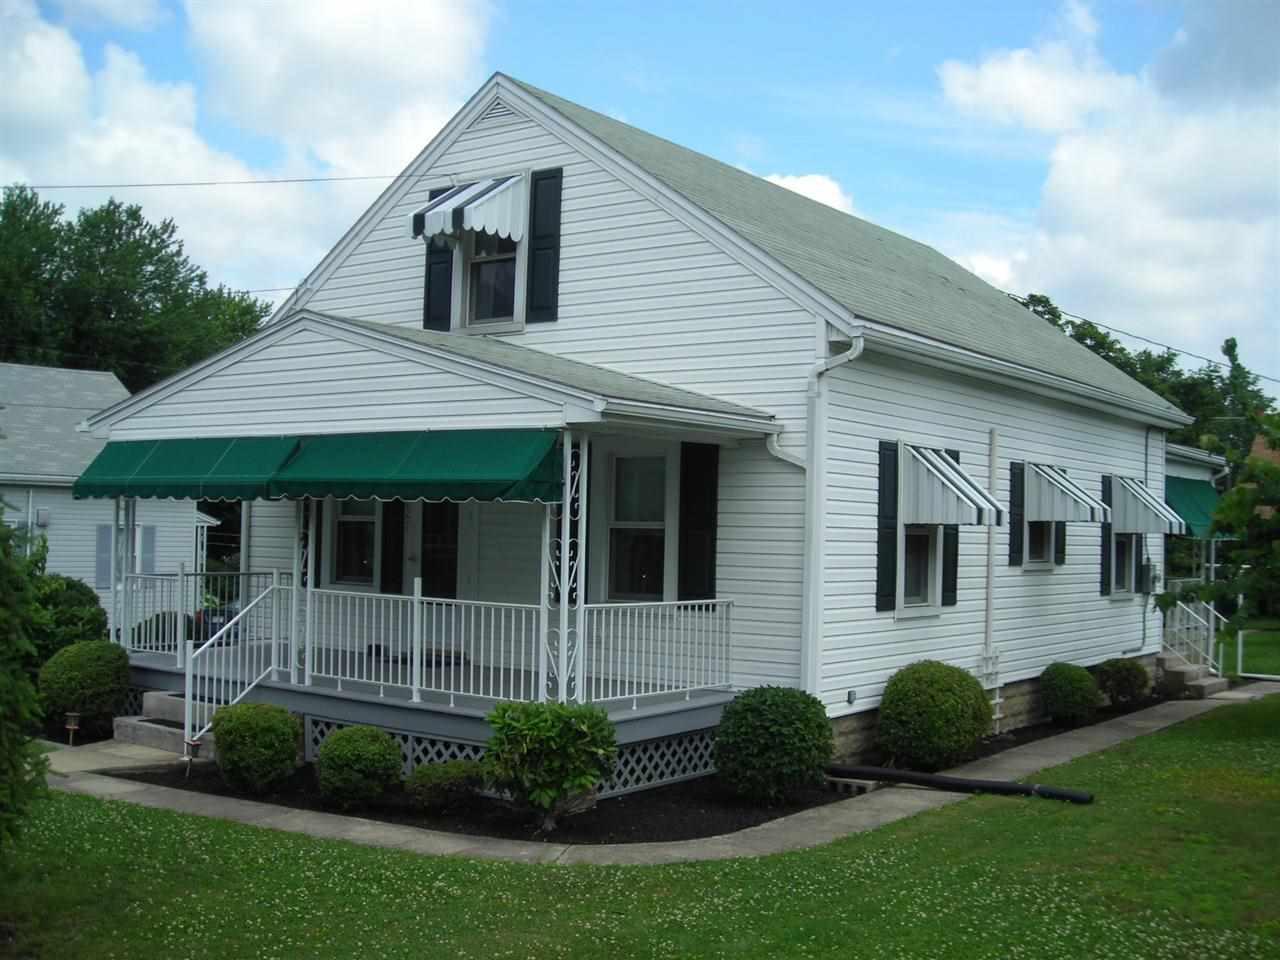 12227 Snyder Ave, Waynesboro, PA 17268